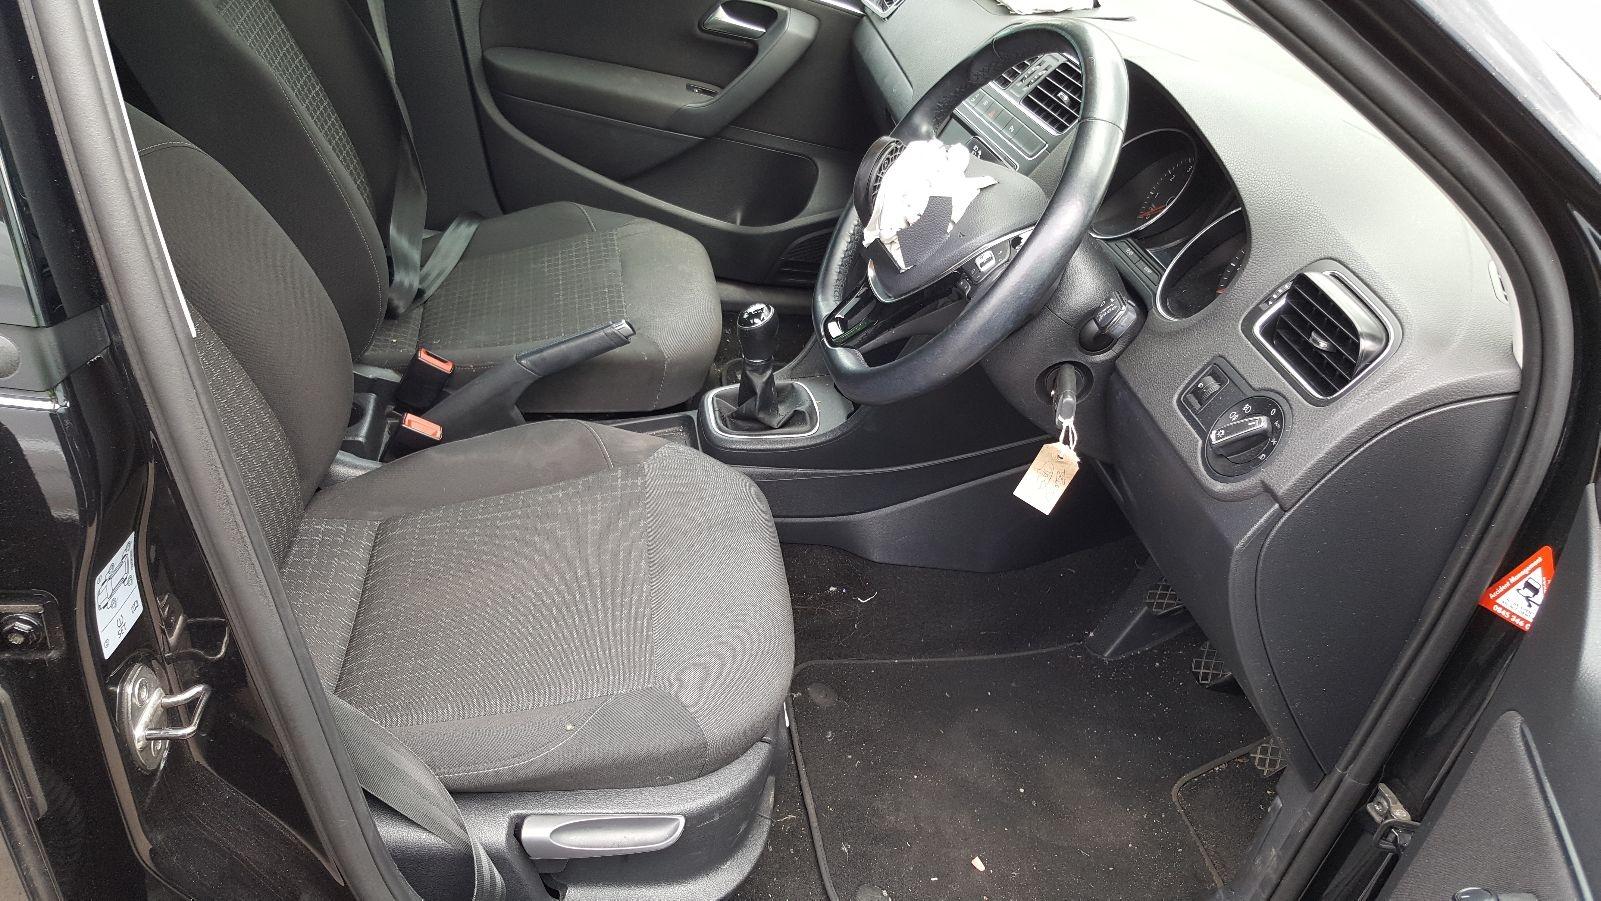 View Auto part Gearbox Volkswagen Polo 2017